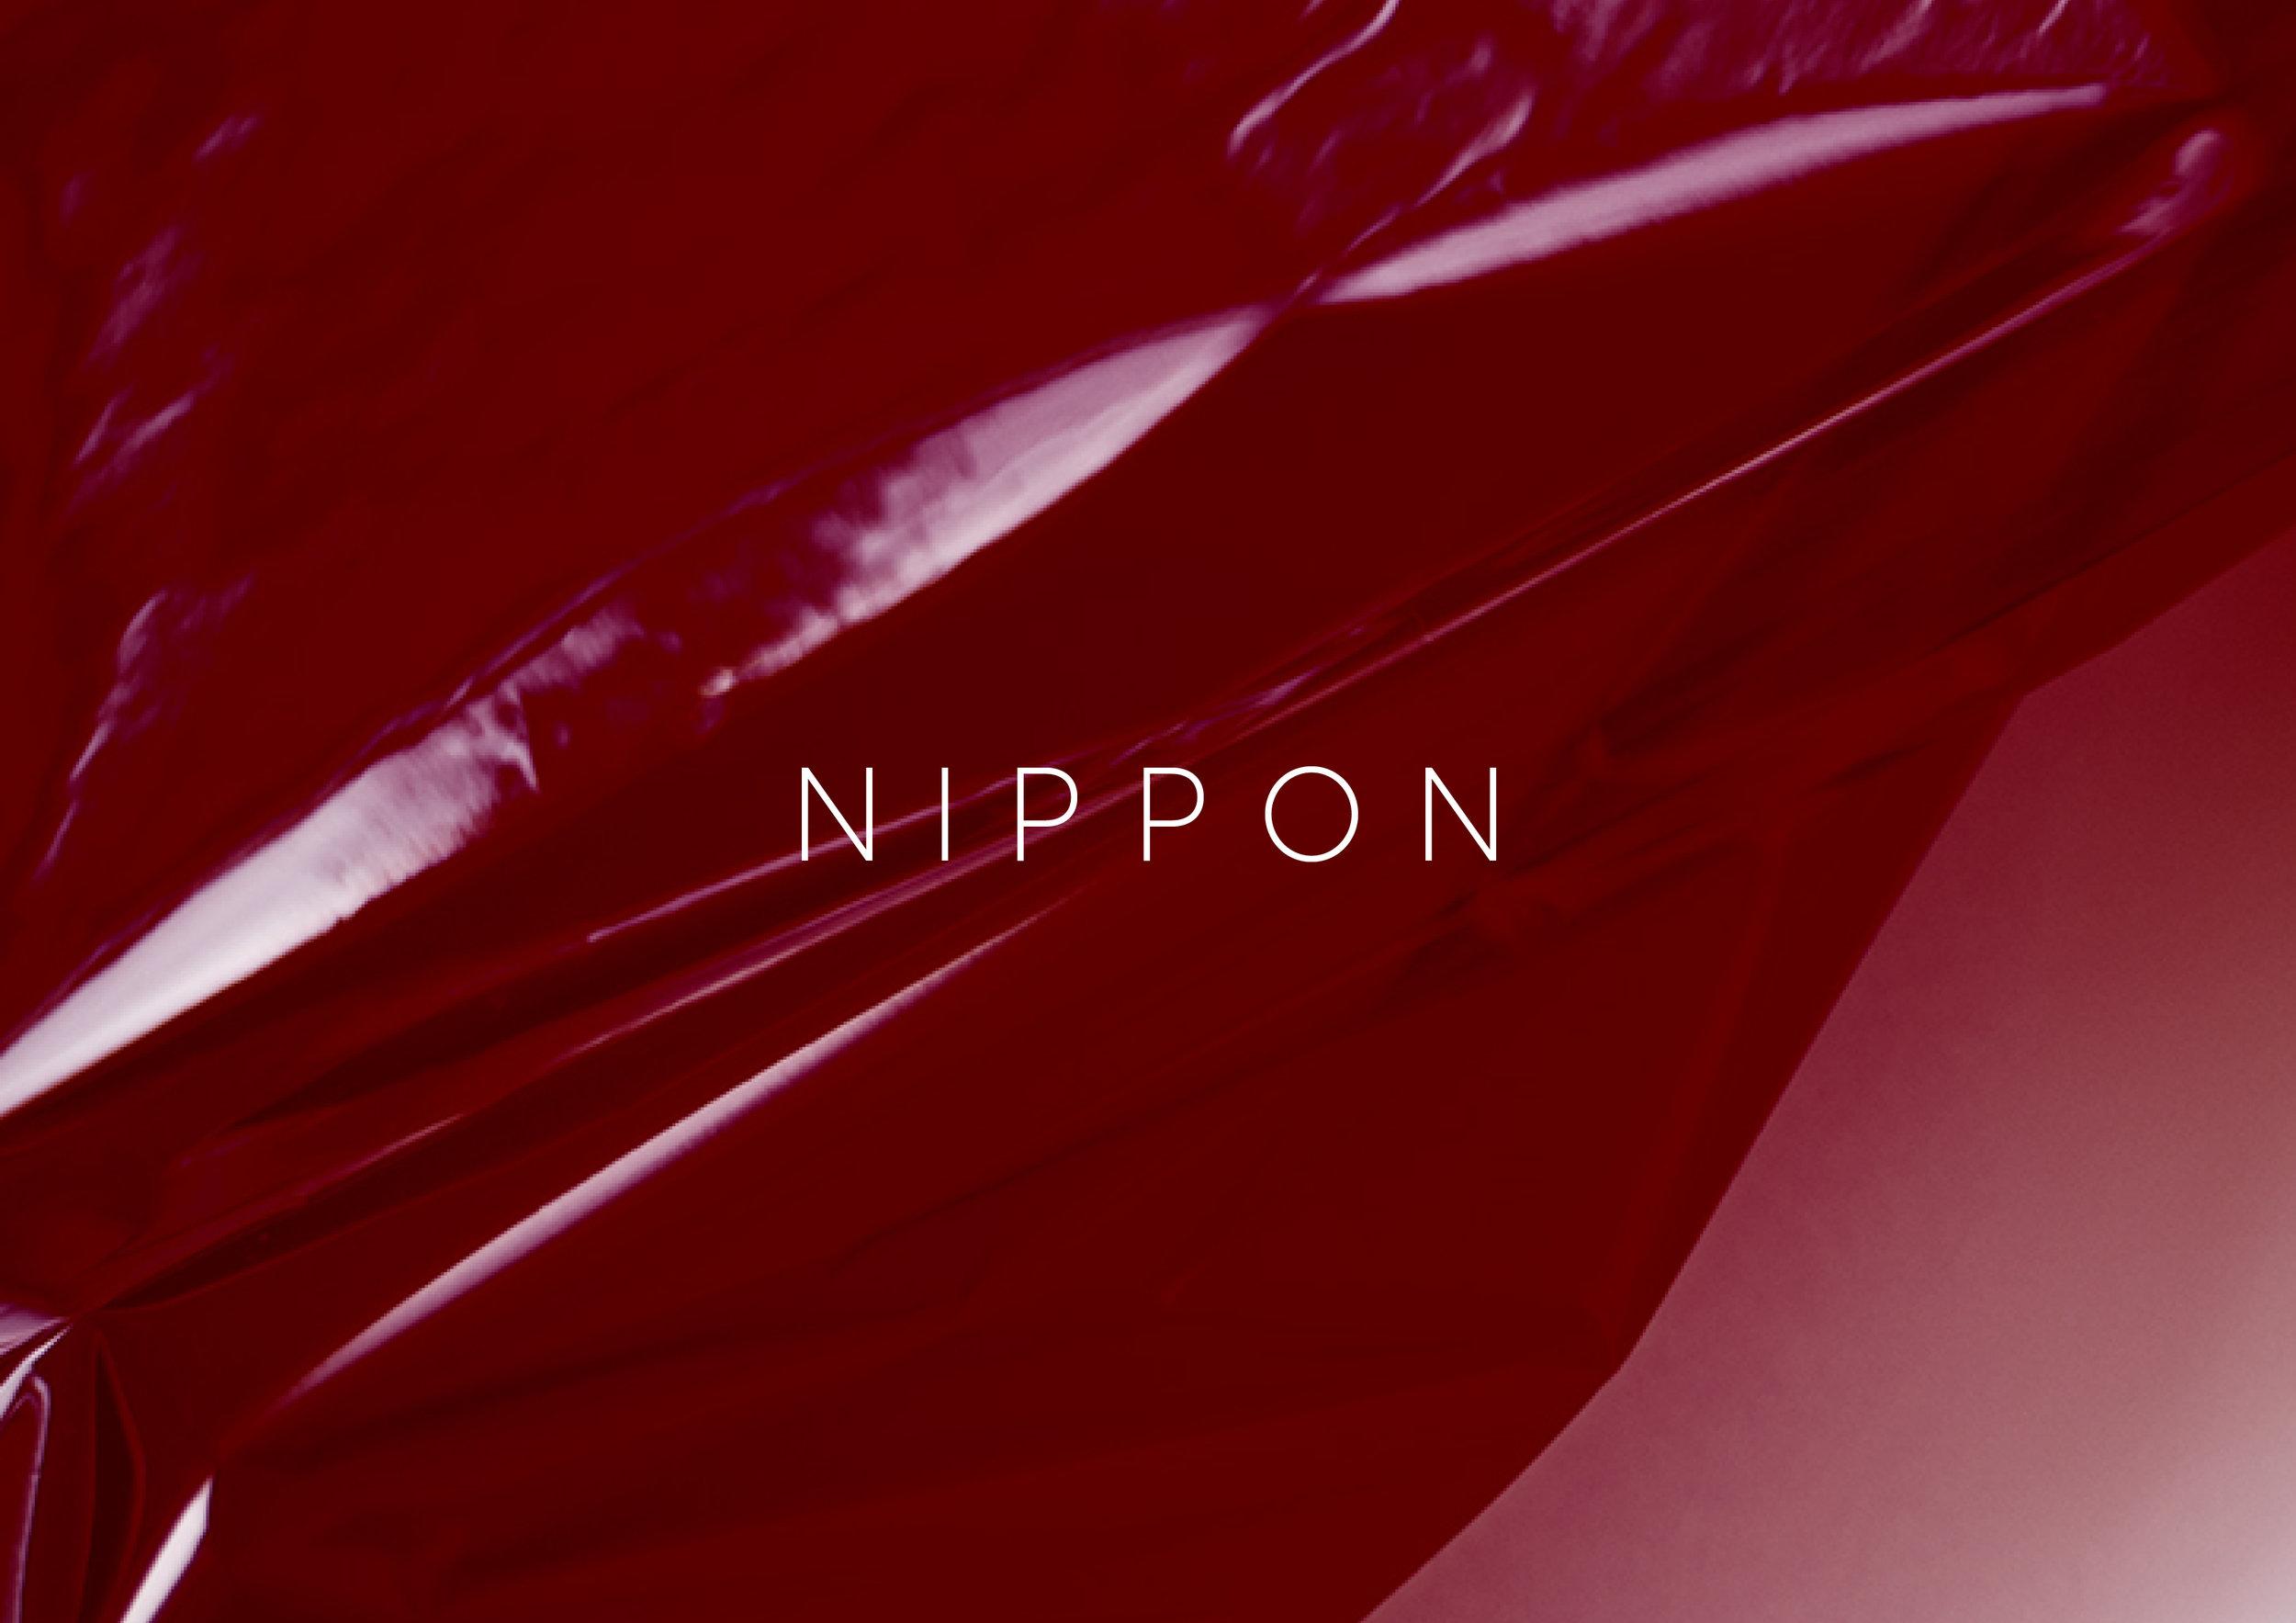 Nippon_01.jpg